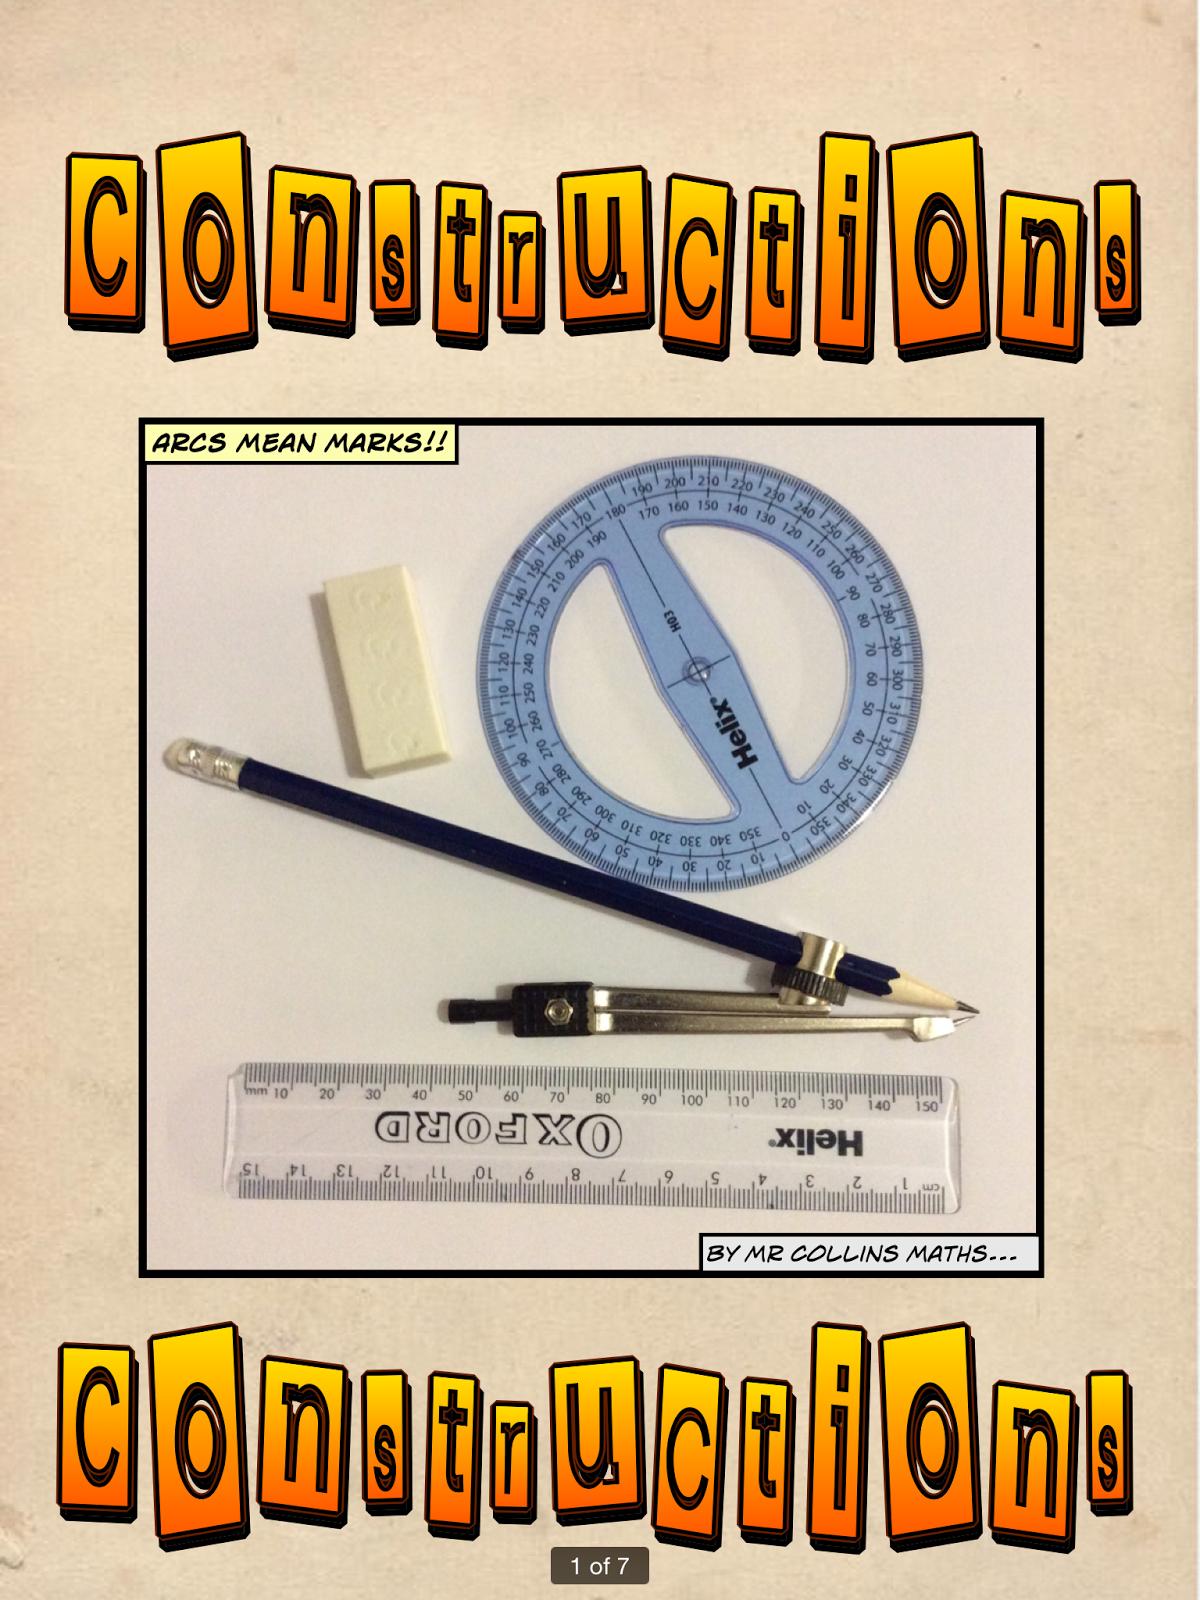 Mr Collins Mathematics Blog Constructions Resources Using